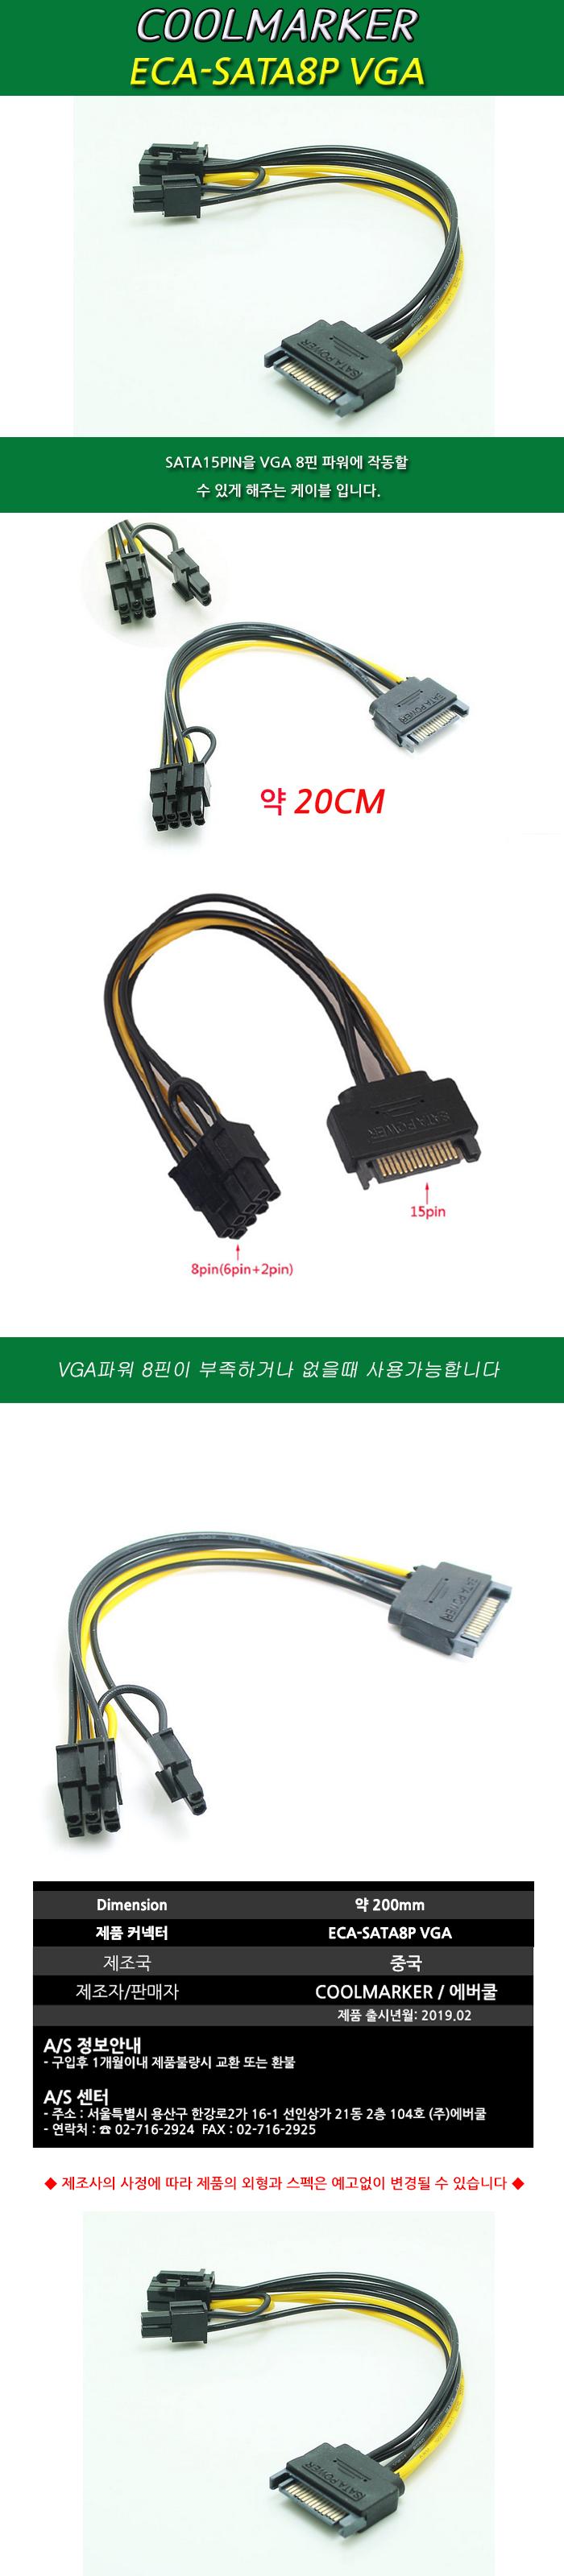 EVERCOOL COOLMARKER ECA-SATA8P VGA